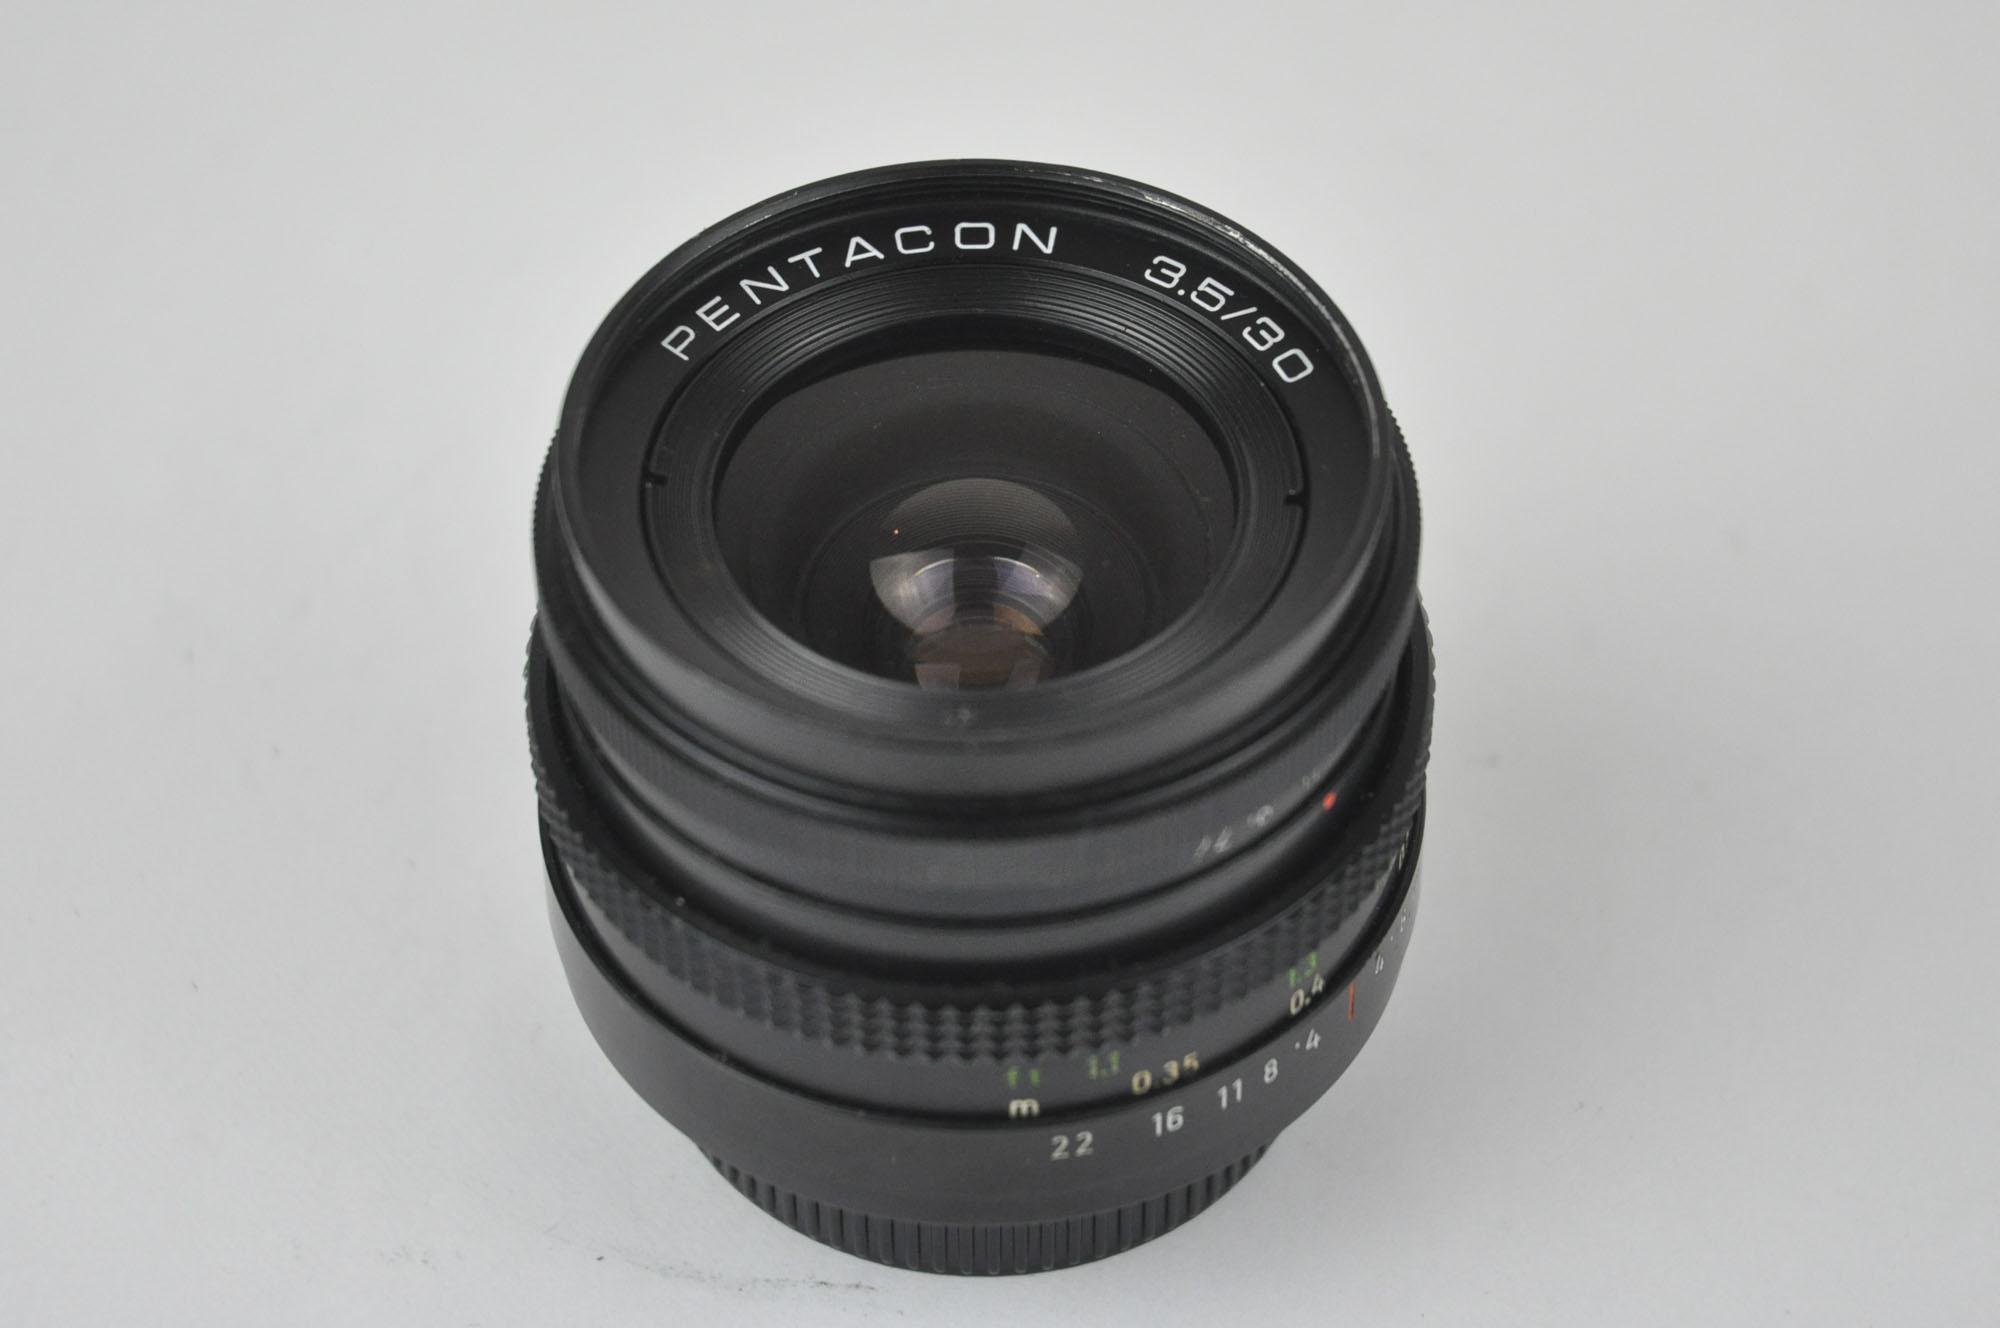 Pentacon 30mm f3.5